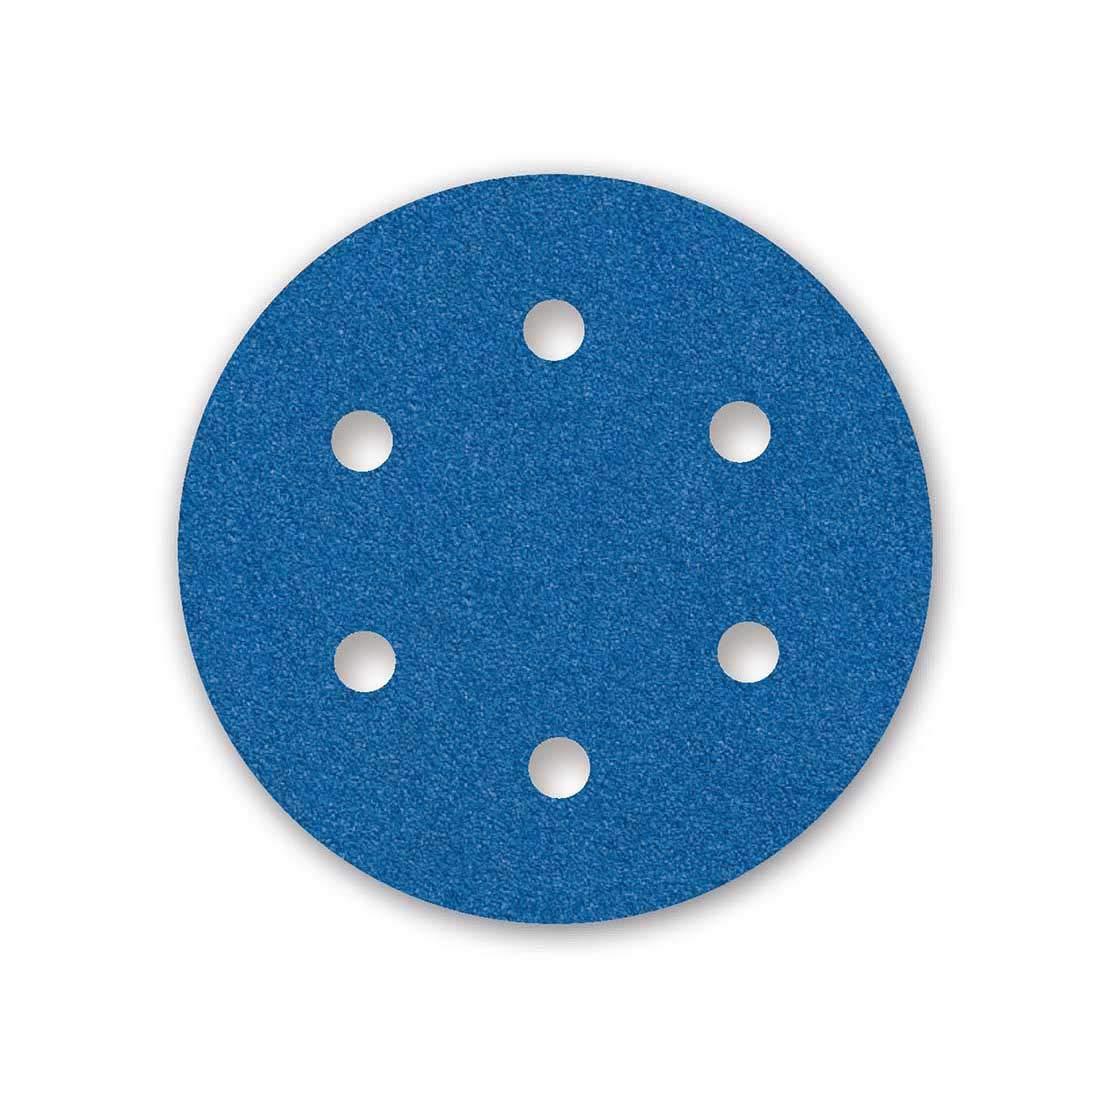 25 Dischi abrasivi velcrati MENZER per levigatrice roto orbitale /Ø 150 mm Grana 80-6 fori